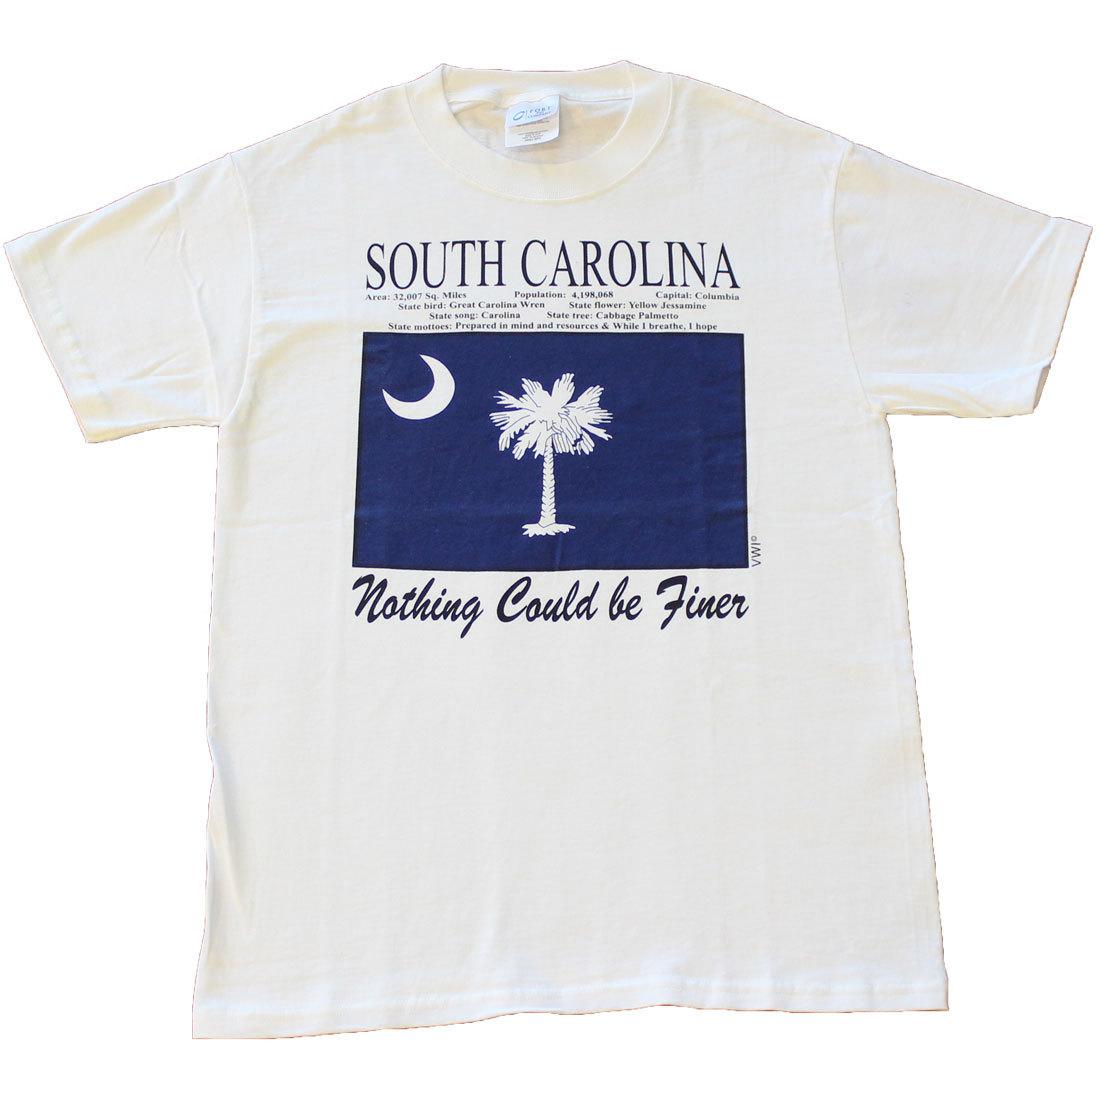 South Carolina State T-Shirt (L)